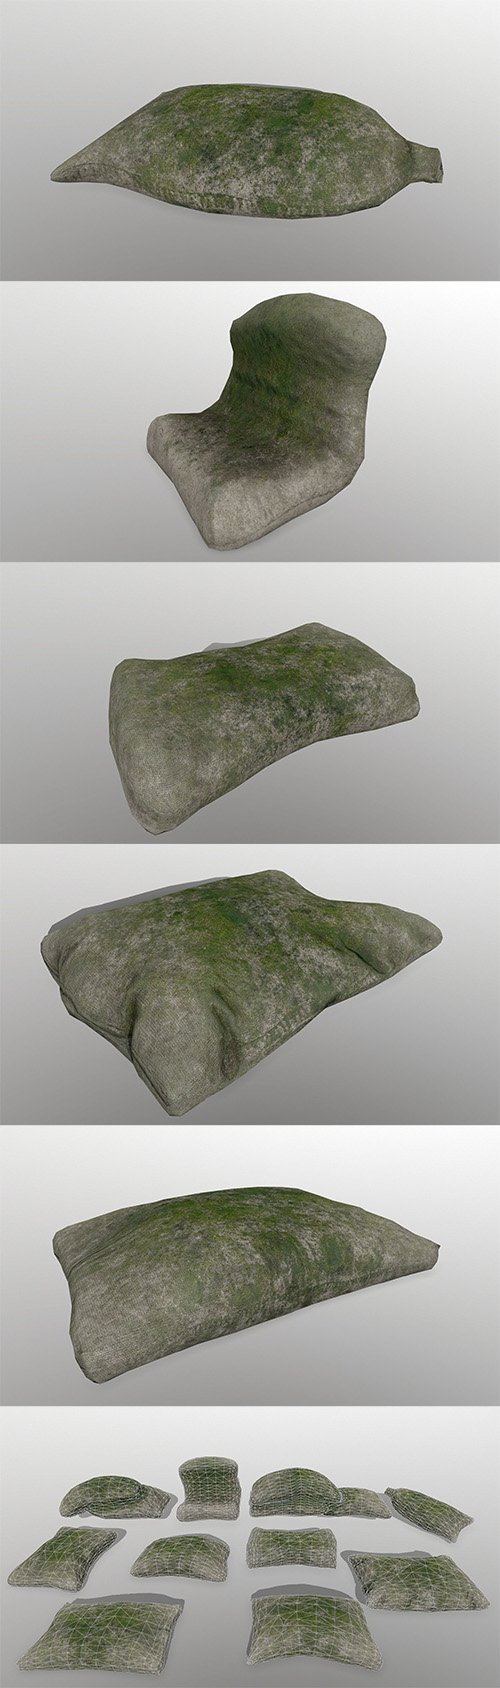 sandbag Low-poly 3D model